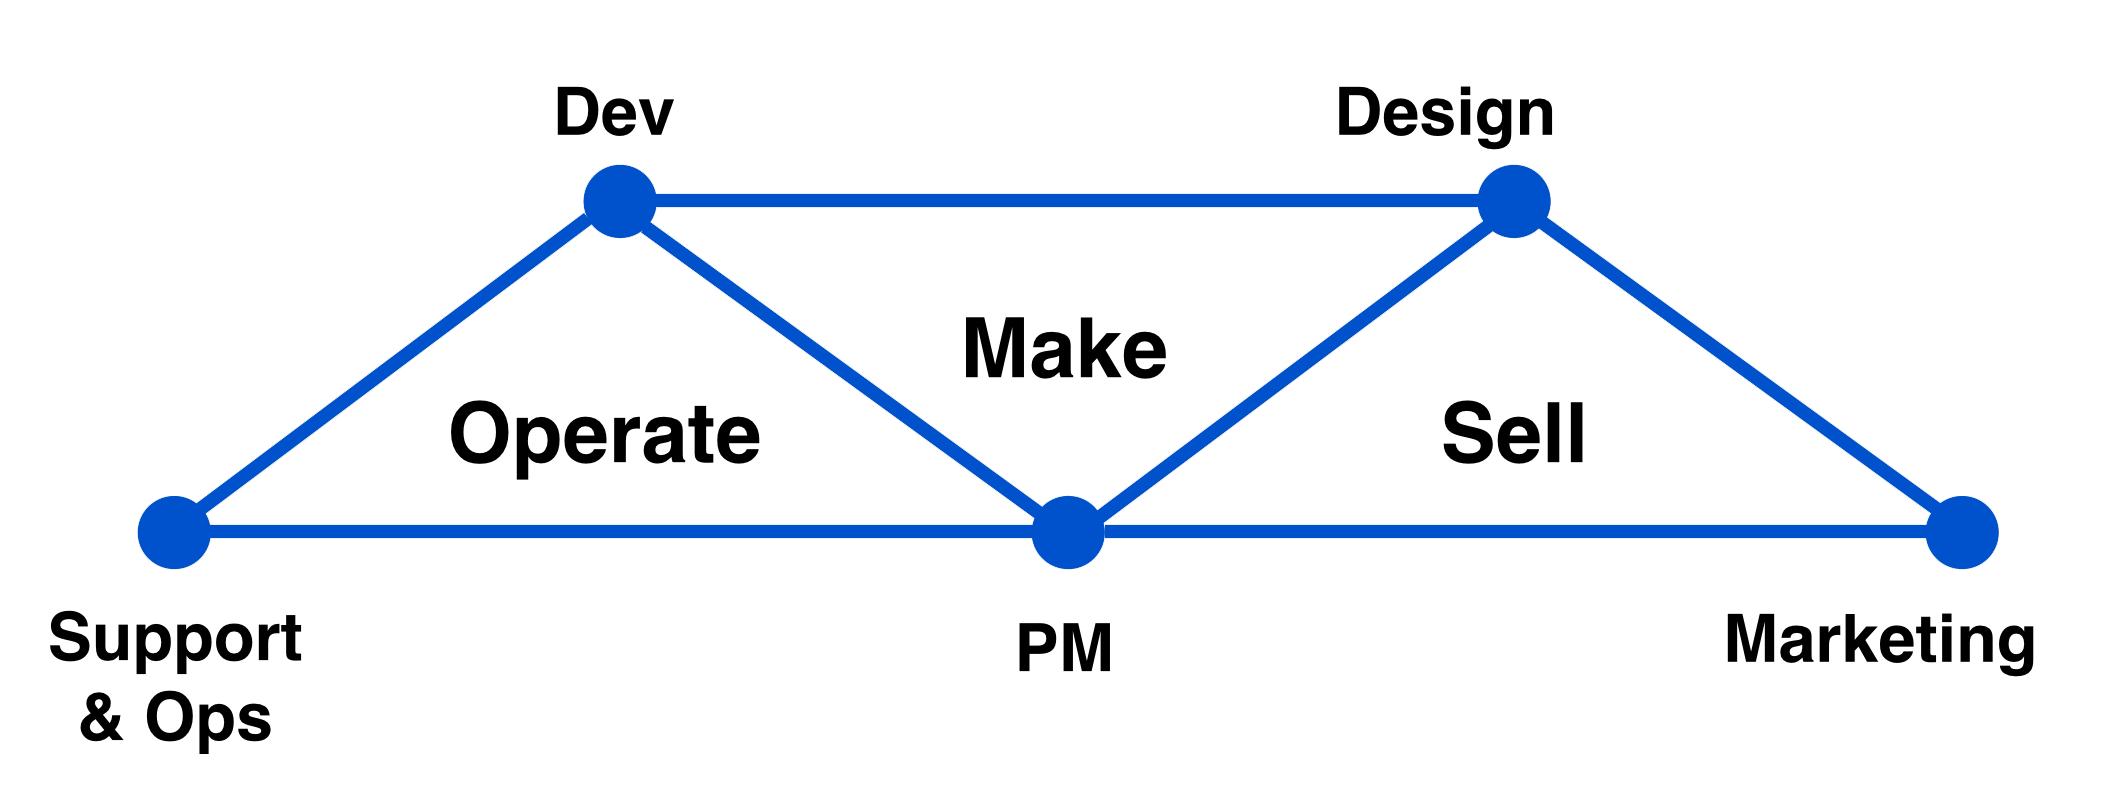 Triadi dei team di Atlassian | Agile Coach Atlassian